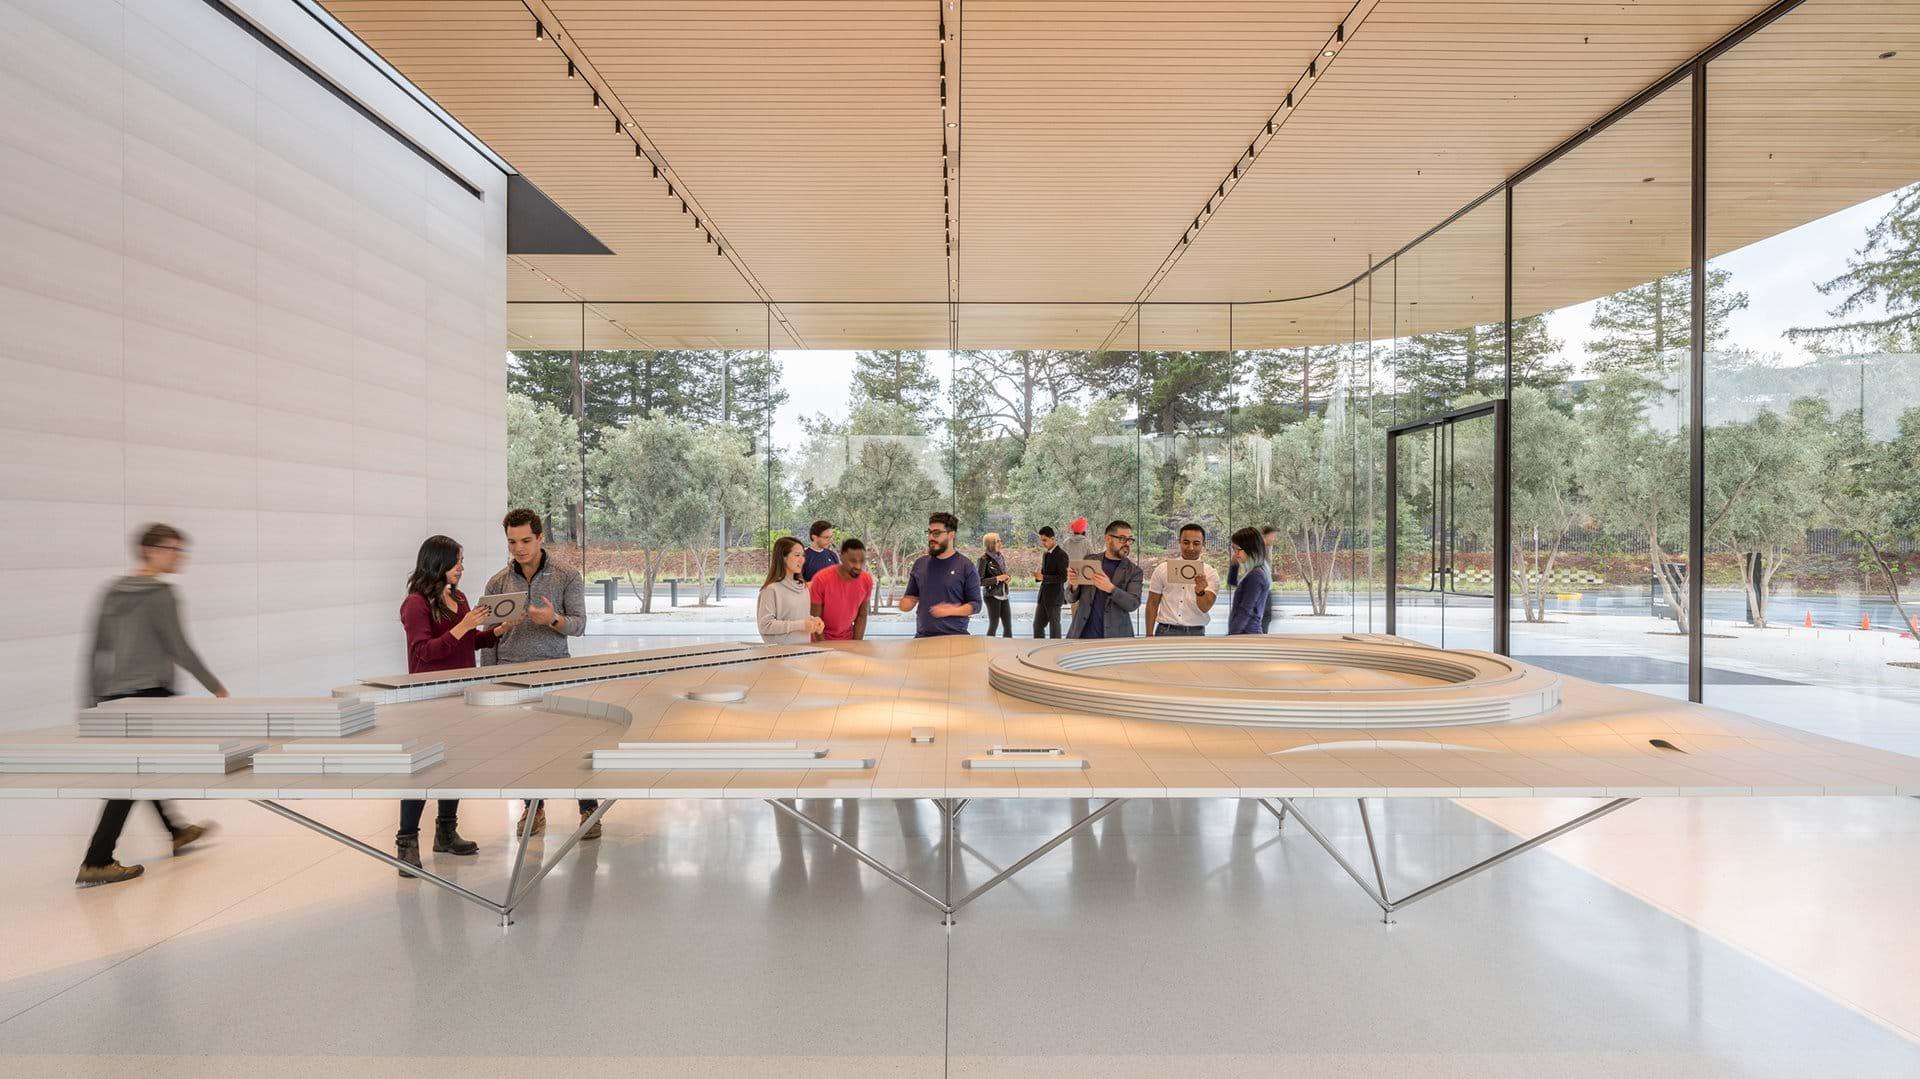 Apple park, visitors center / fosterandpartners.com